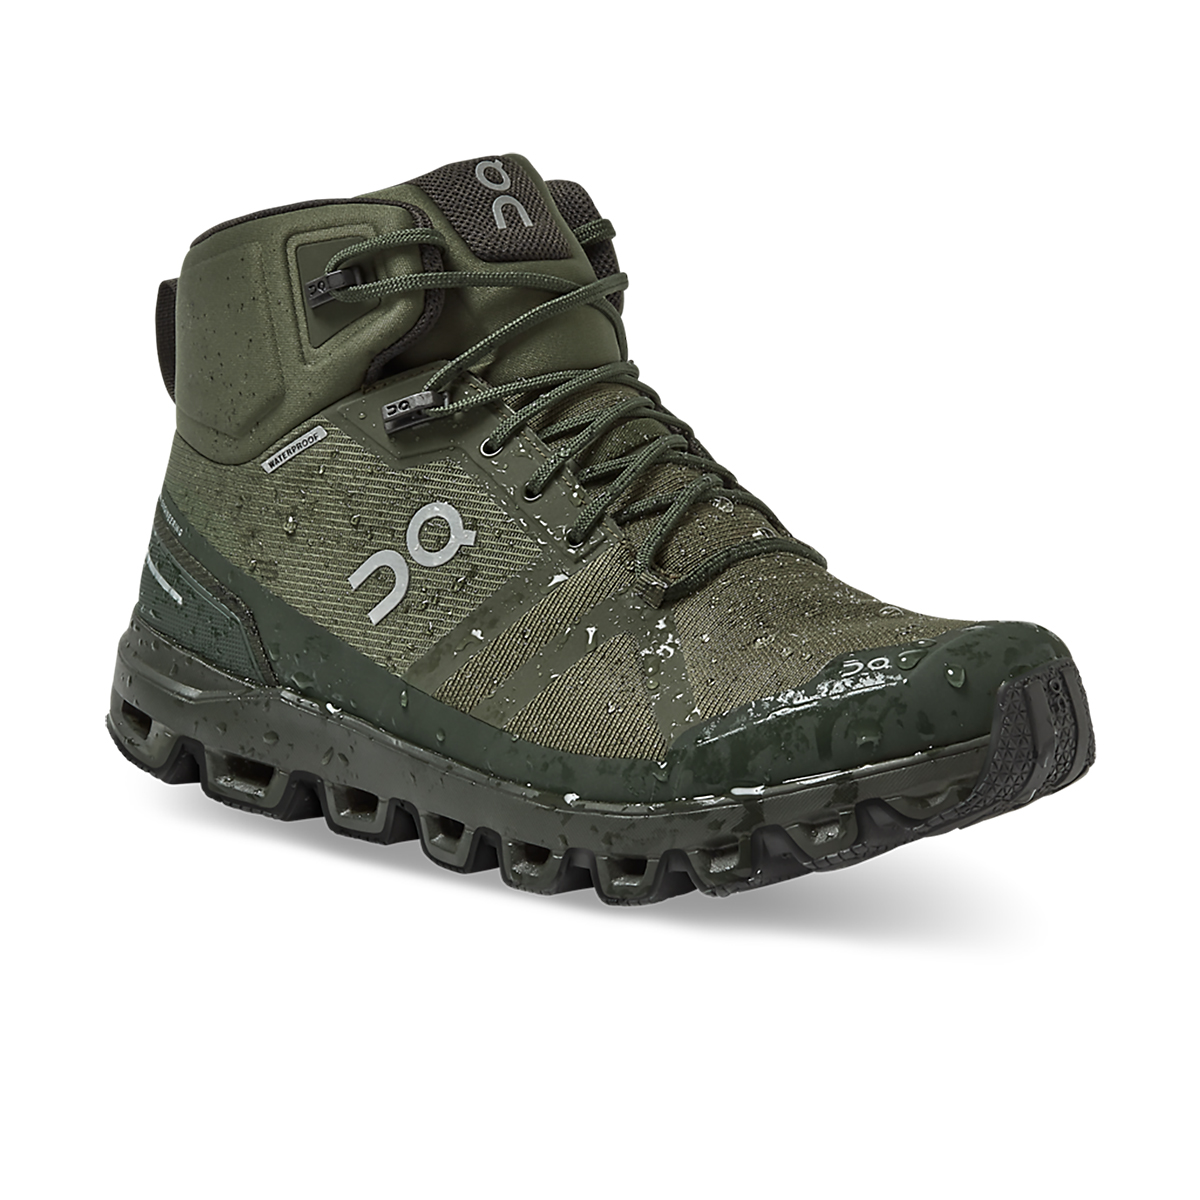 Men's On Cloudrock Waterproof Trail Running Shoe - Color: Jungle/Fir - Size: 7 - Width: Regular, Jungle/Fir, large, image 2